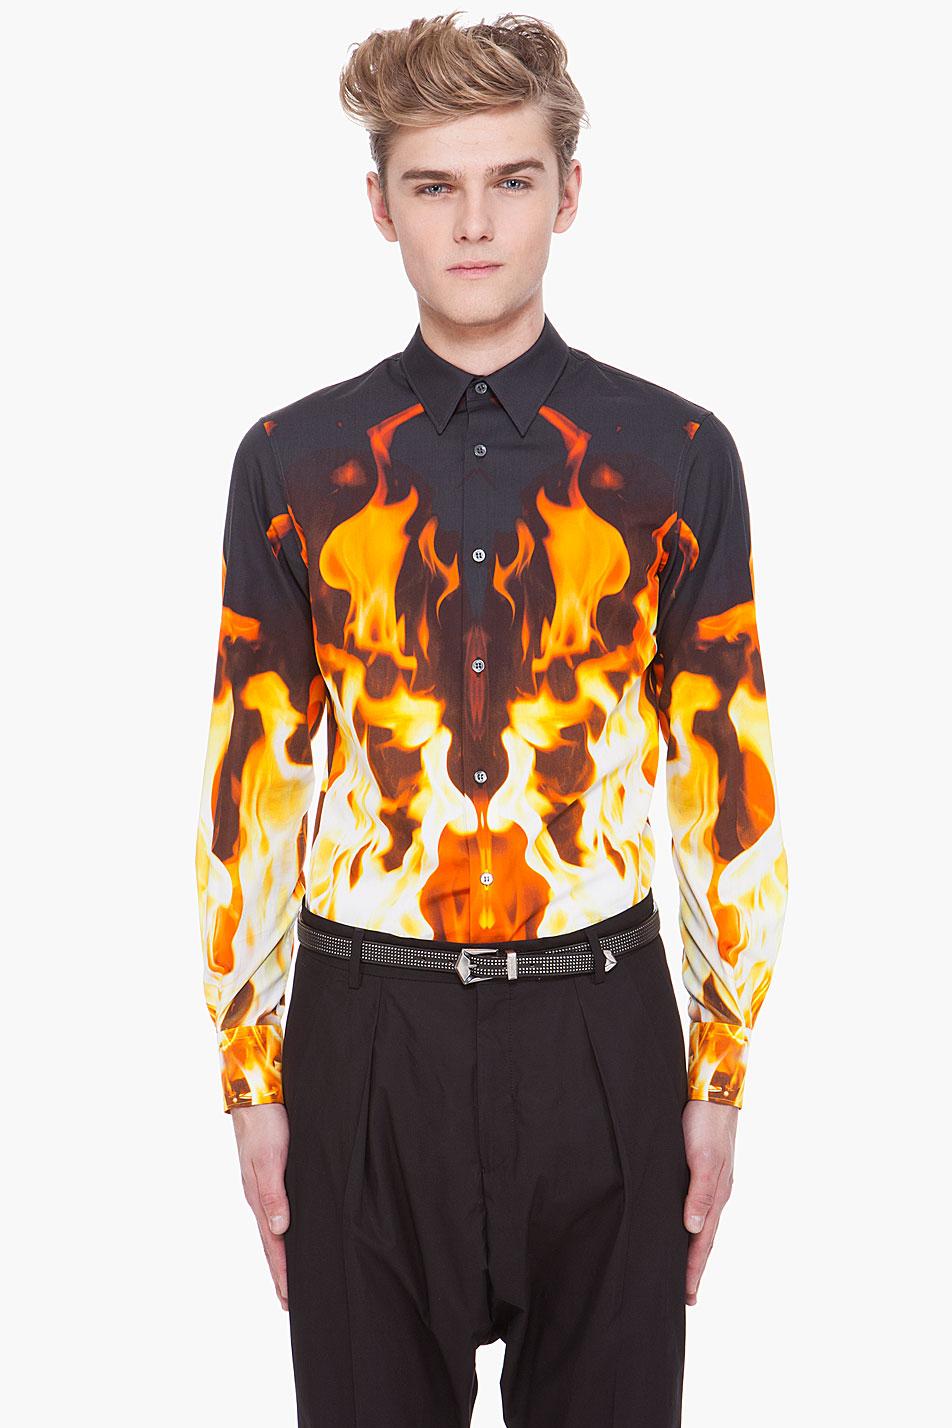 Alexander mcqueen Fire Print Shirt in Black for Men